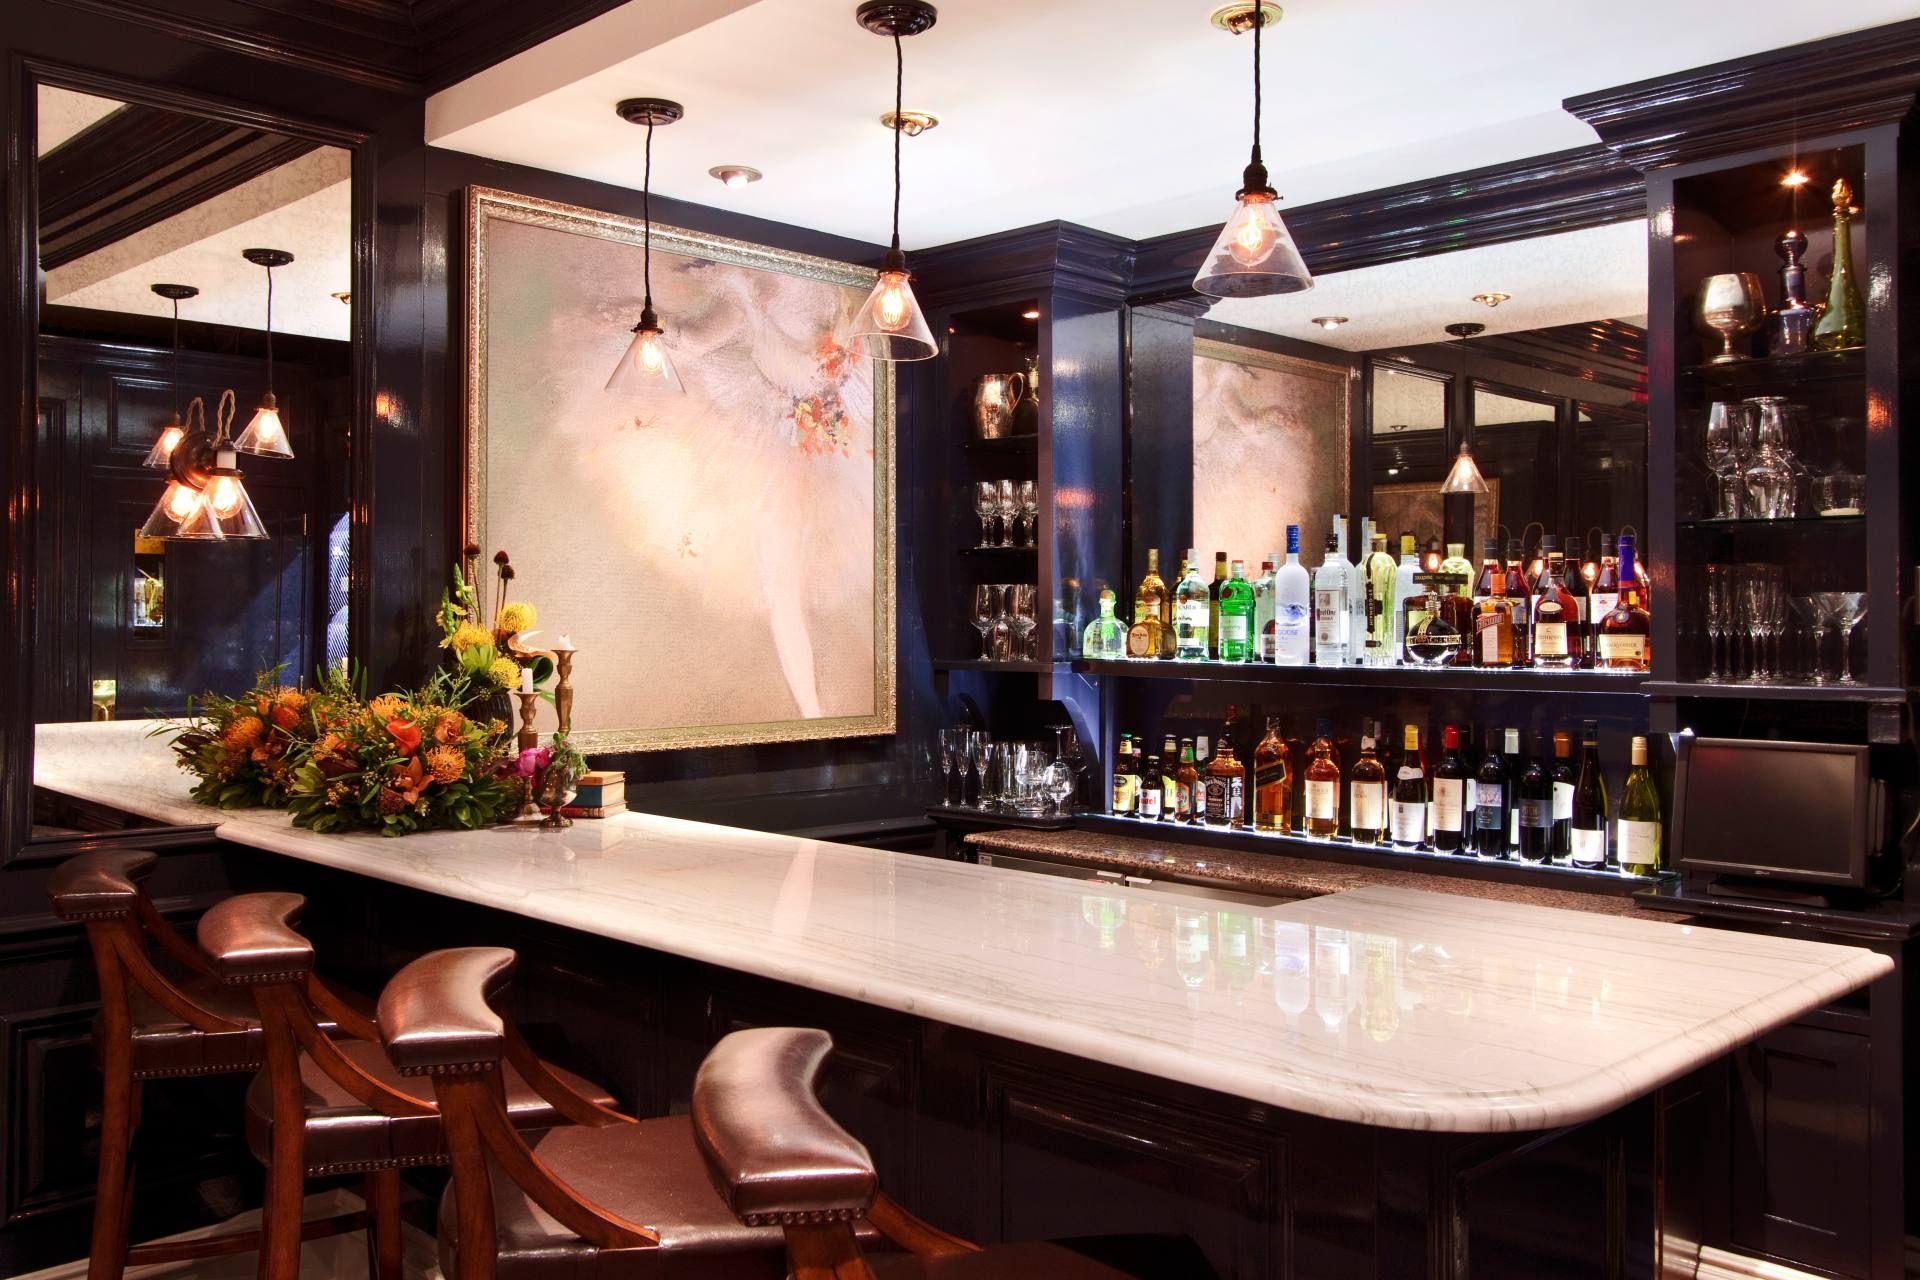 Lantern S Keep Photos Nyc Cocktail Bars Iroquois New York Secret Bar Hotel Bar Hidden Bar